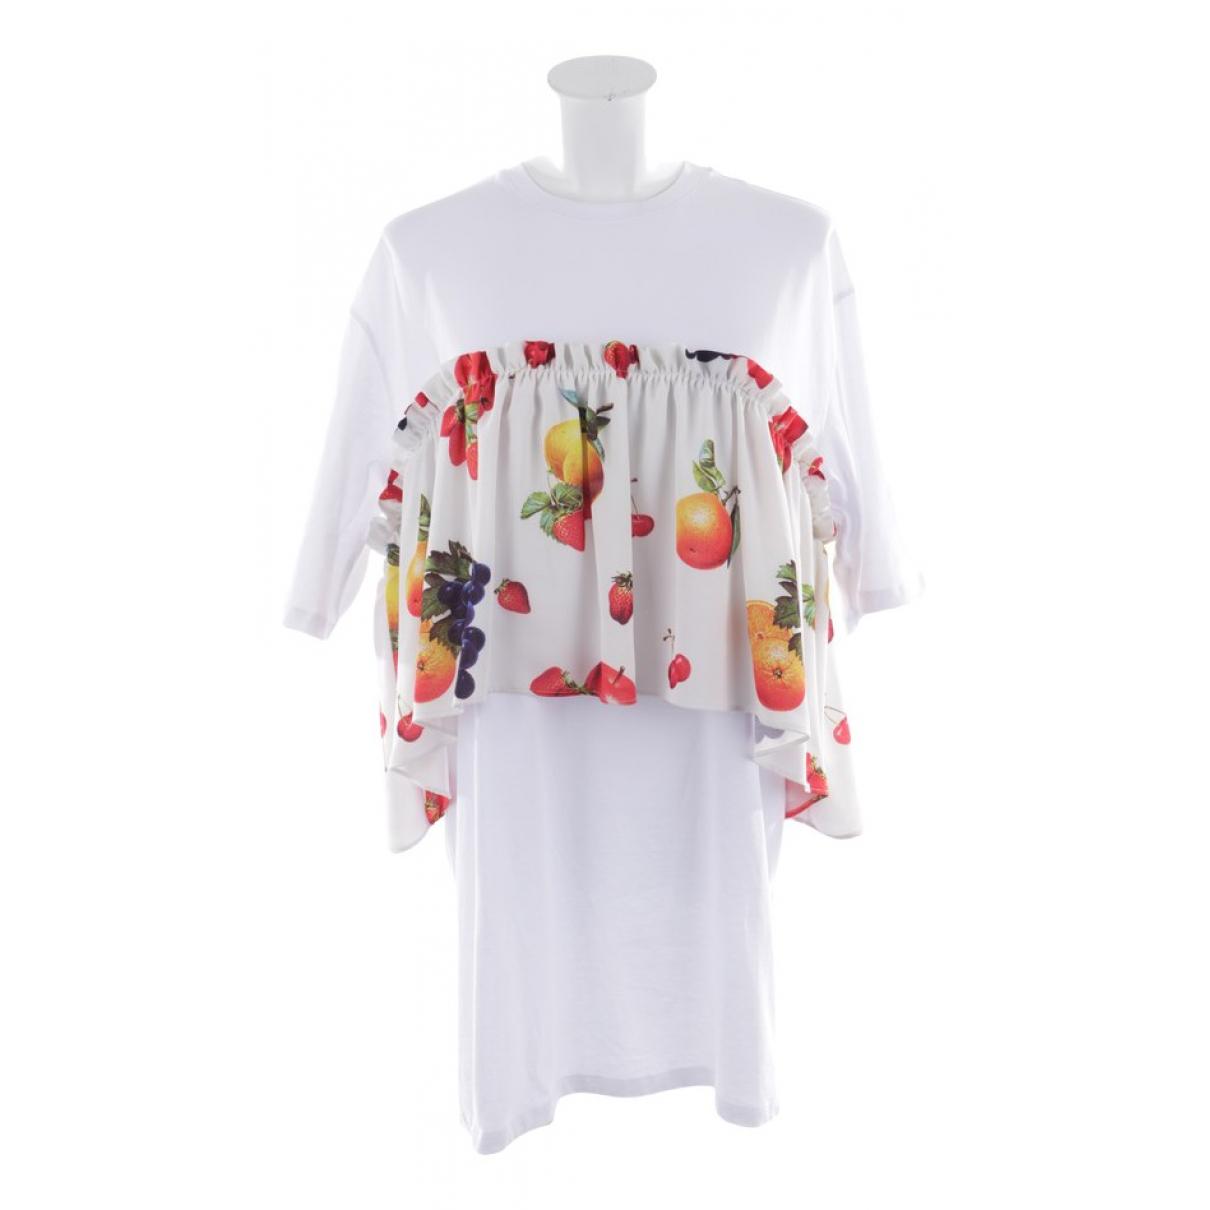 Msgm \N White Cotton dress for Women S International